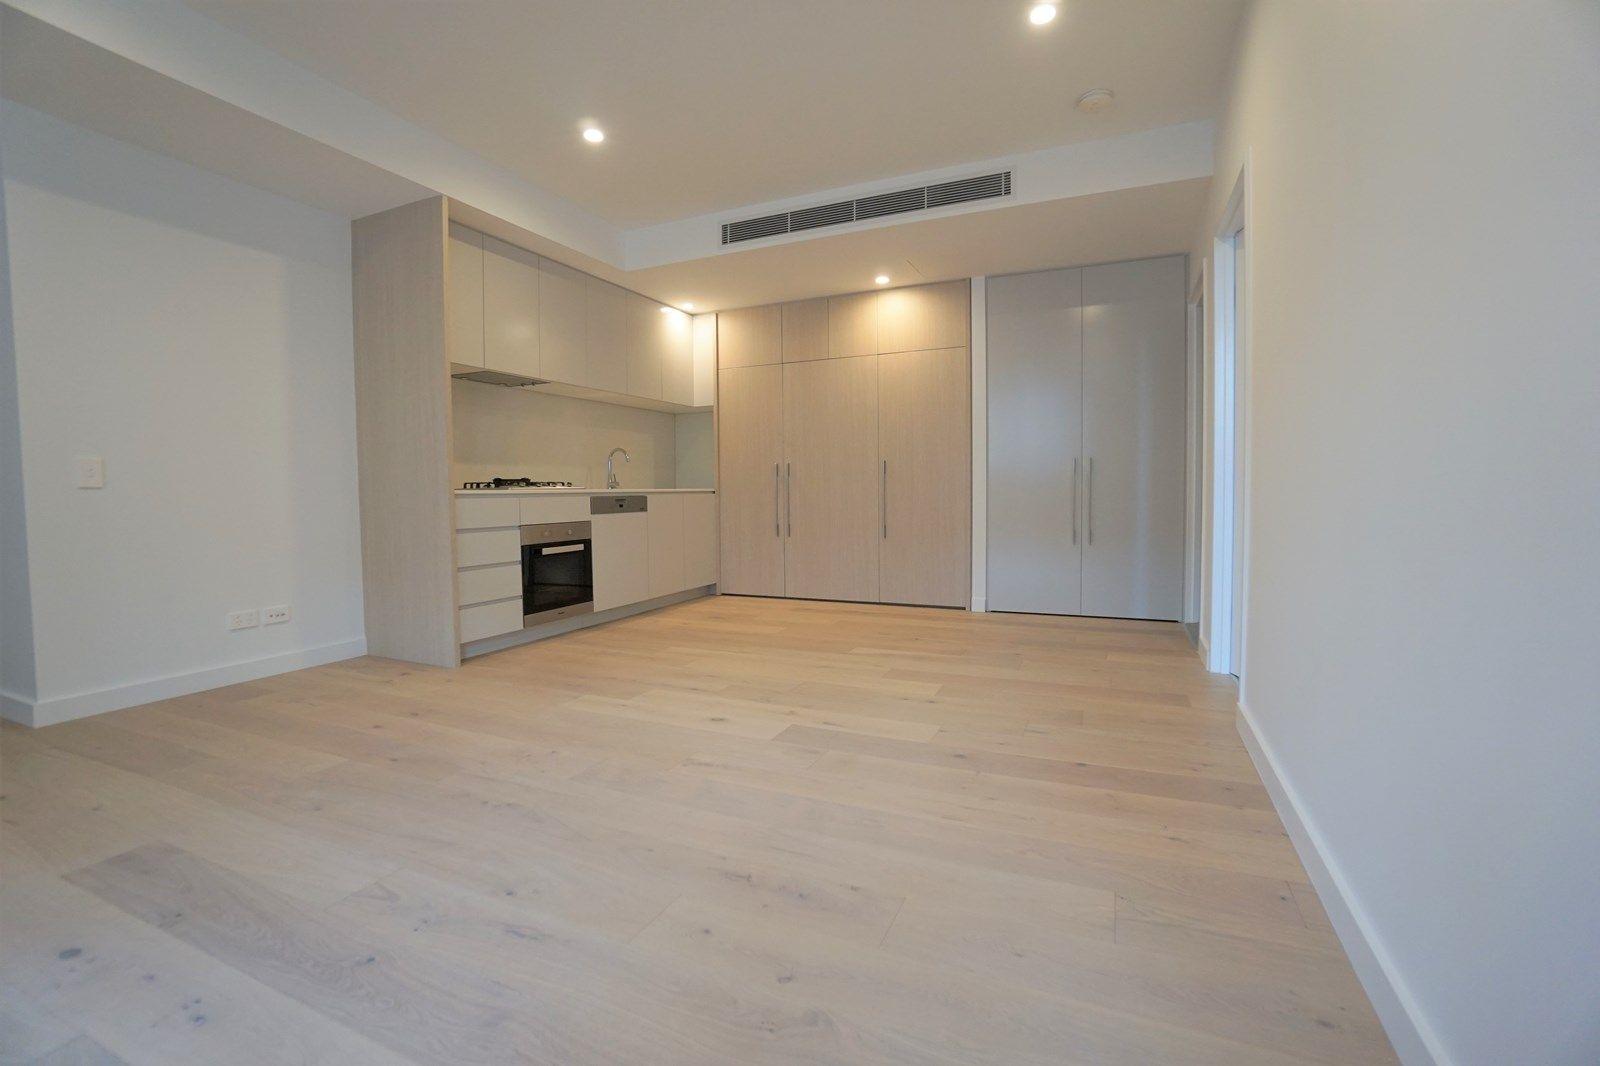 4.201/18 Hannah Street, Beecroft NSW 2119, Image 1